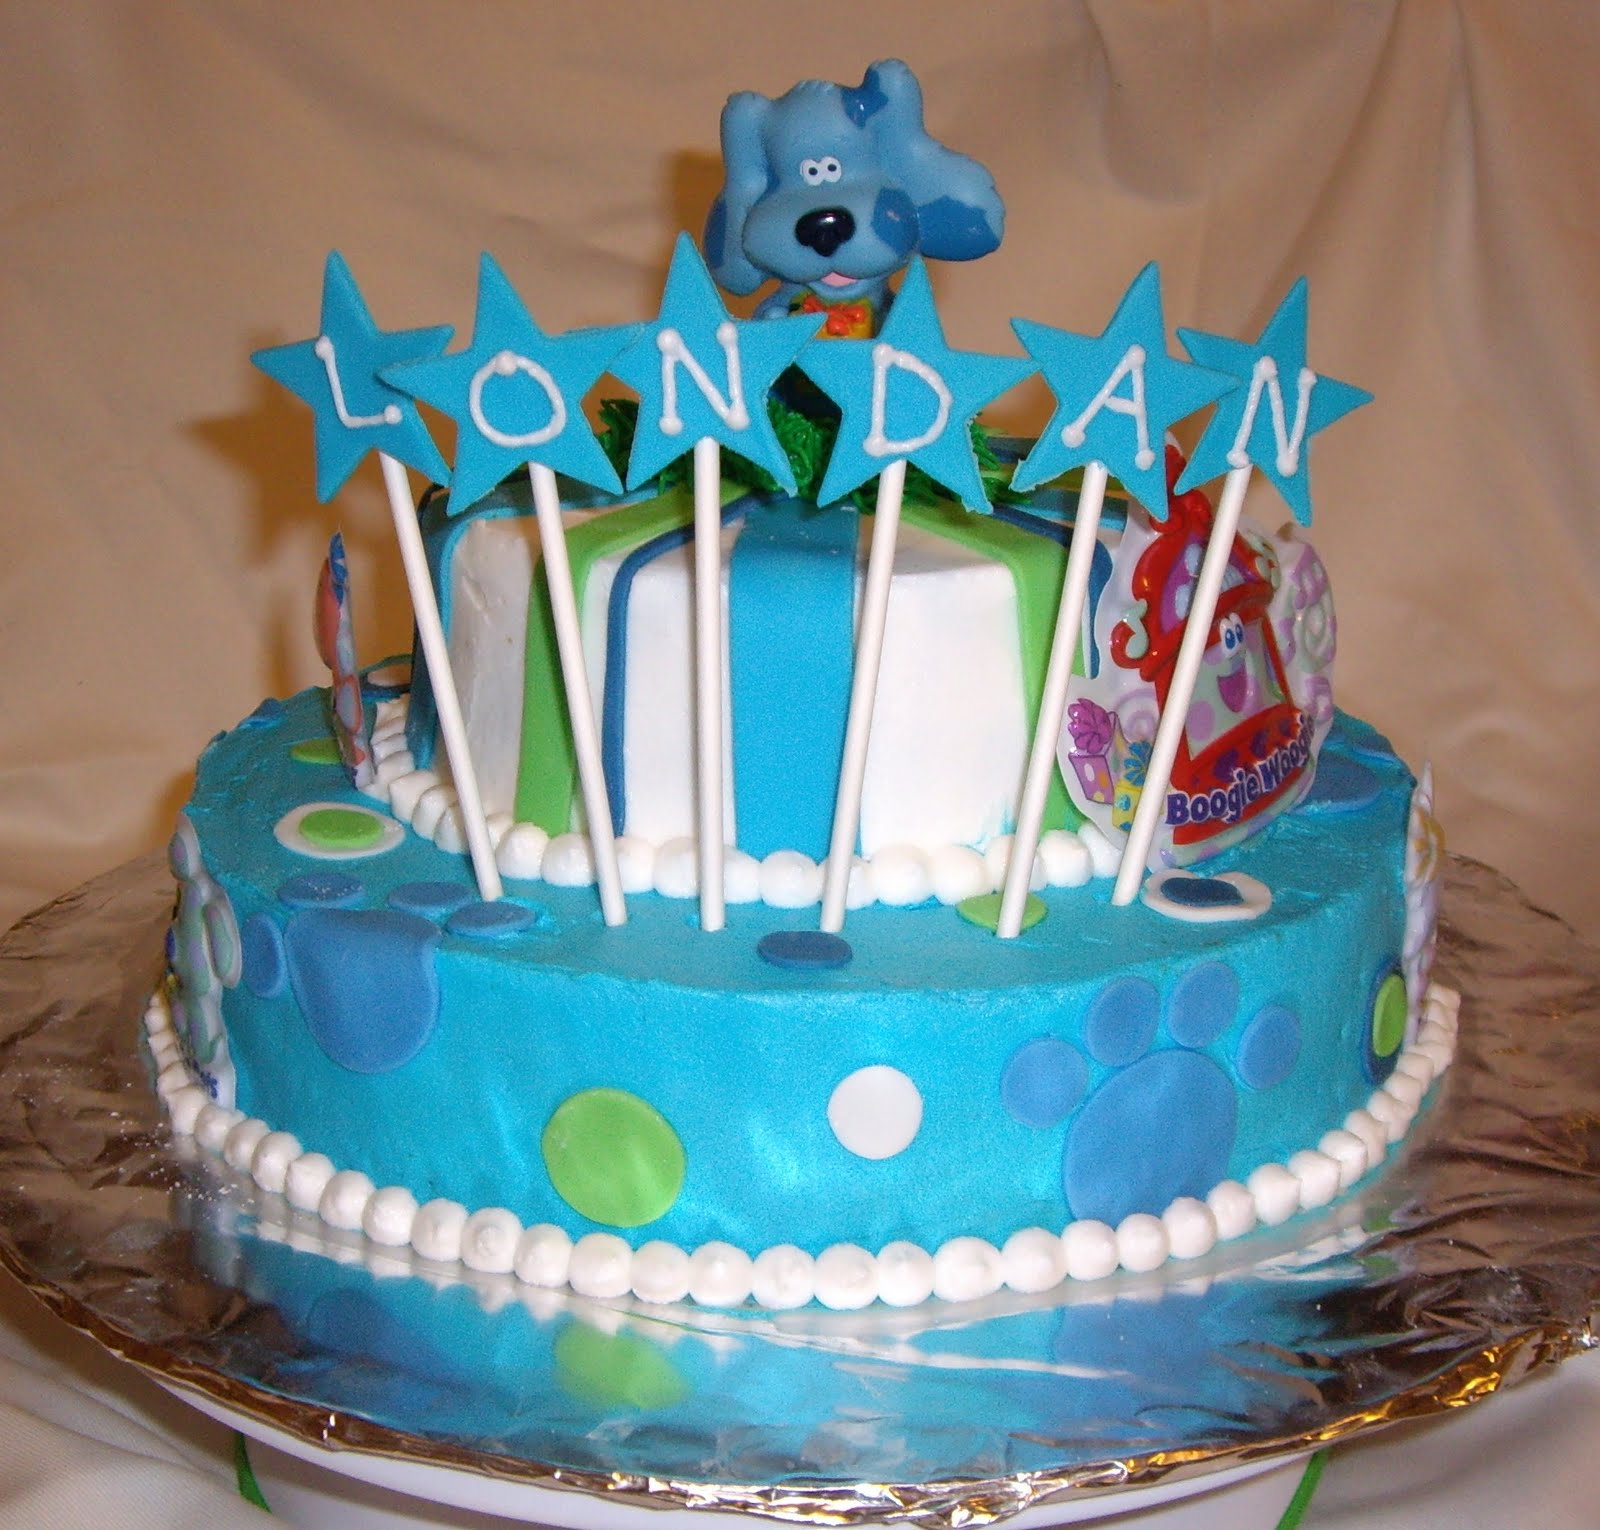 birthday cake blues clues image inspiration of cake and birthday